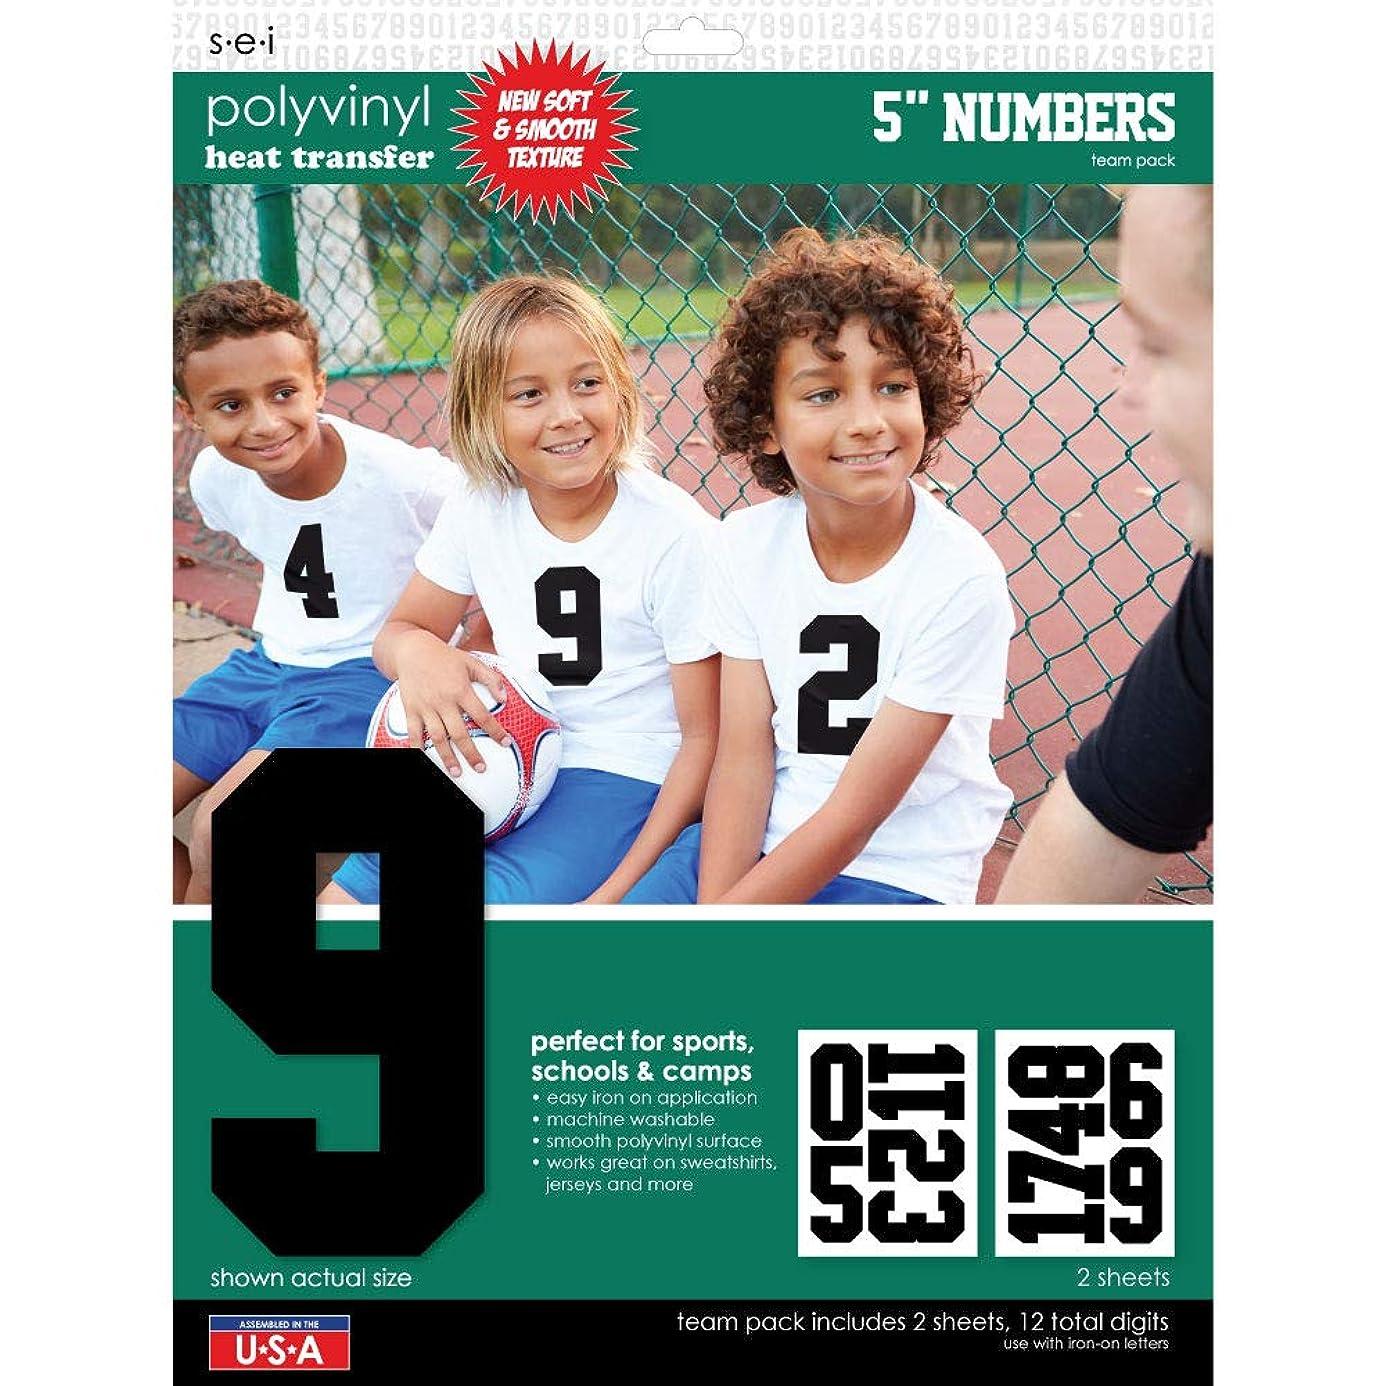 ESI SEI Sport Letter Polyvinyl Heat Transfers Scrapbook, Multi-Colour, 34.29 x 26.03 x 0.2 cm